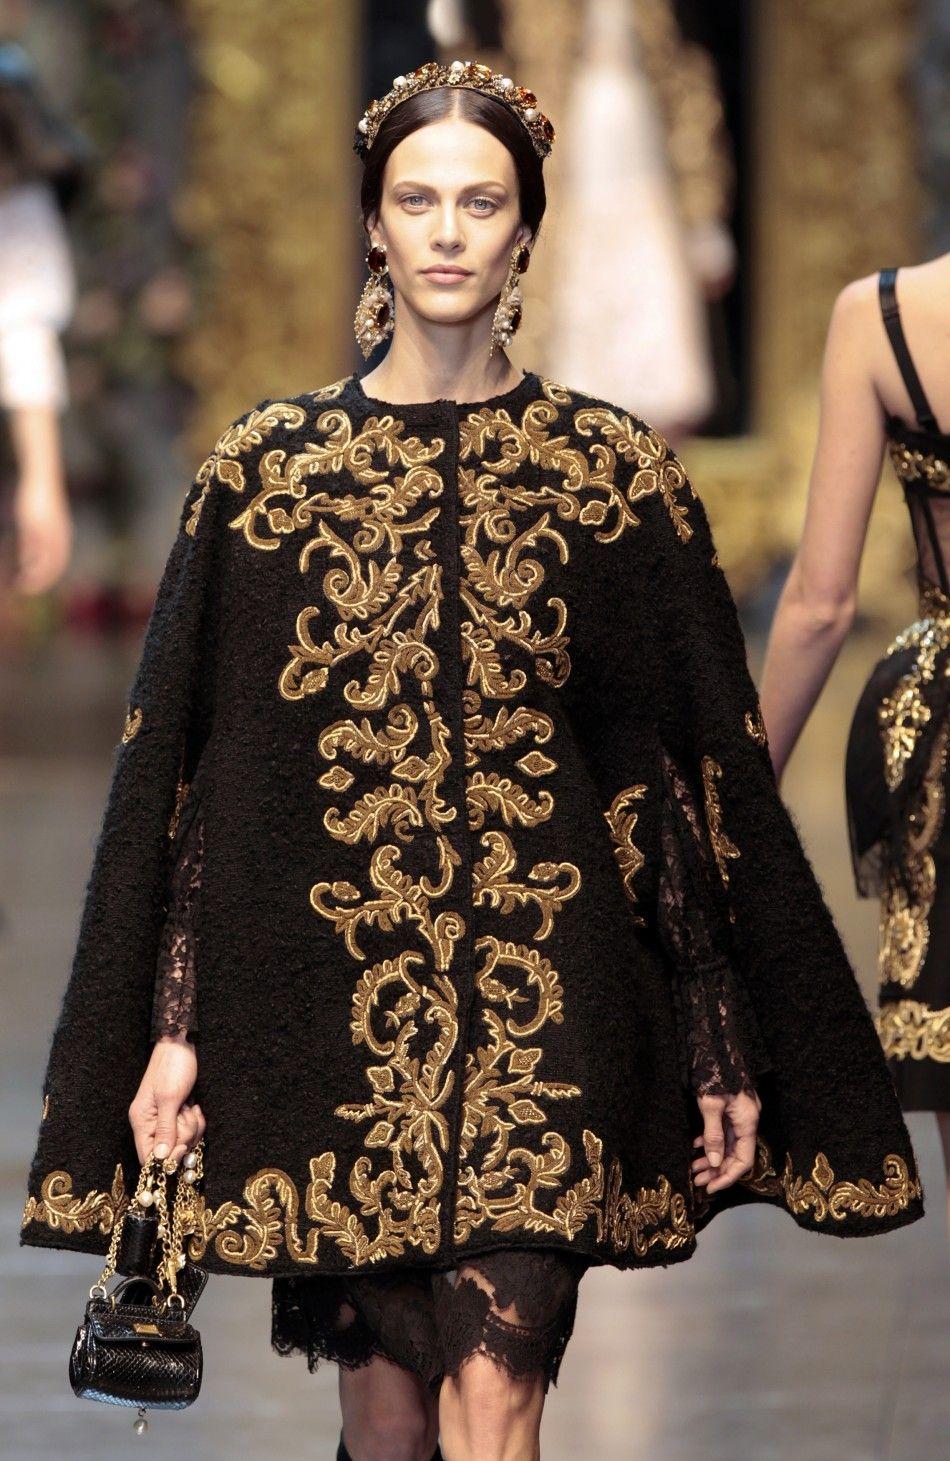 Dolce Gabbana 39 S Baroque Romanticism At 2012 Milan Fashion Week Dolce And Gabbana